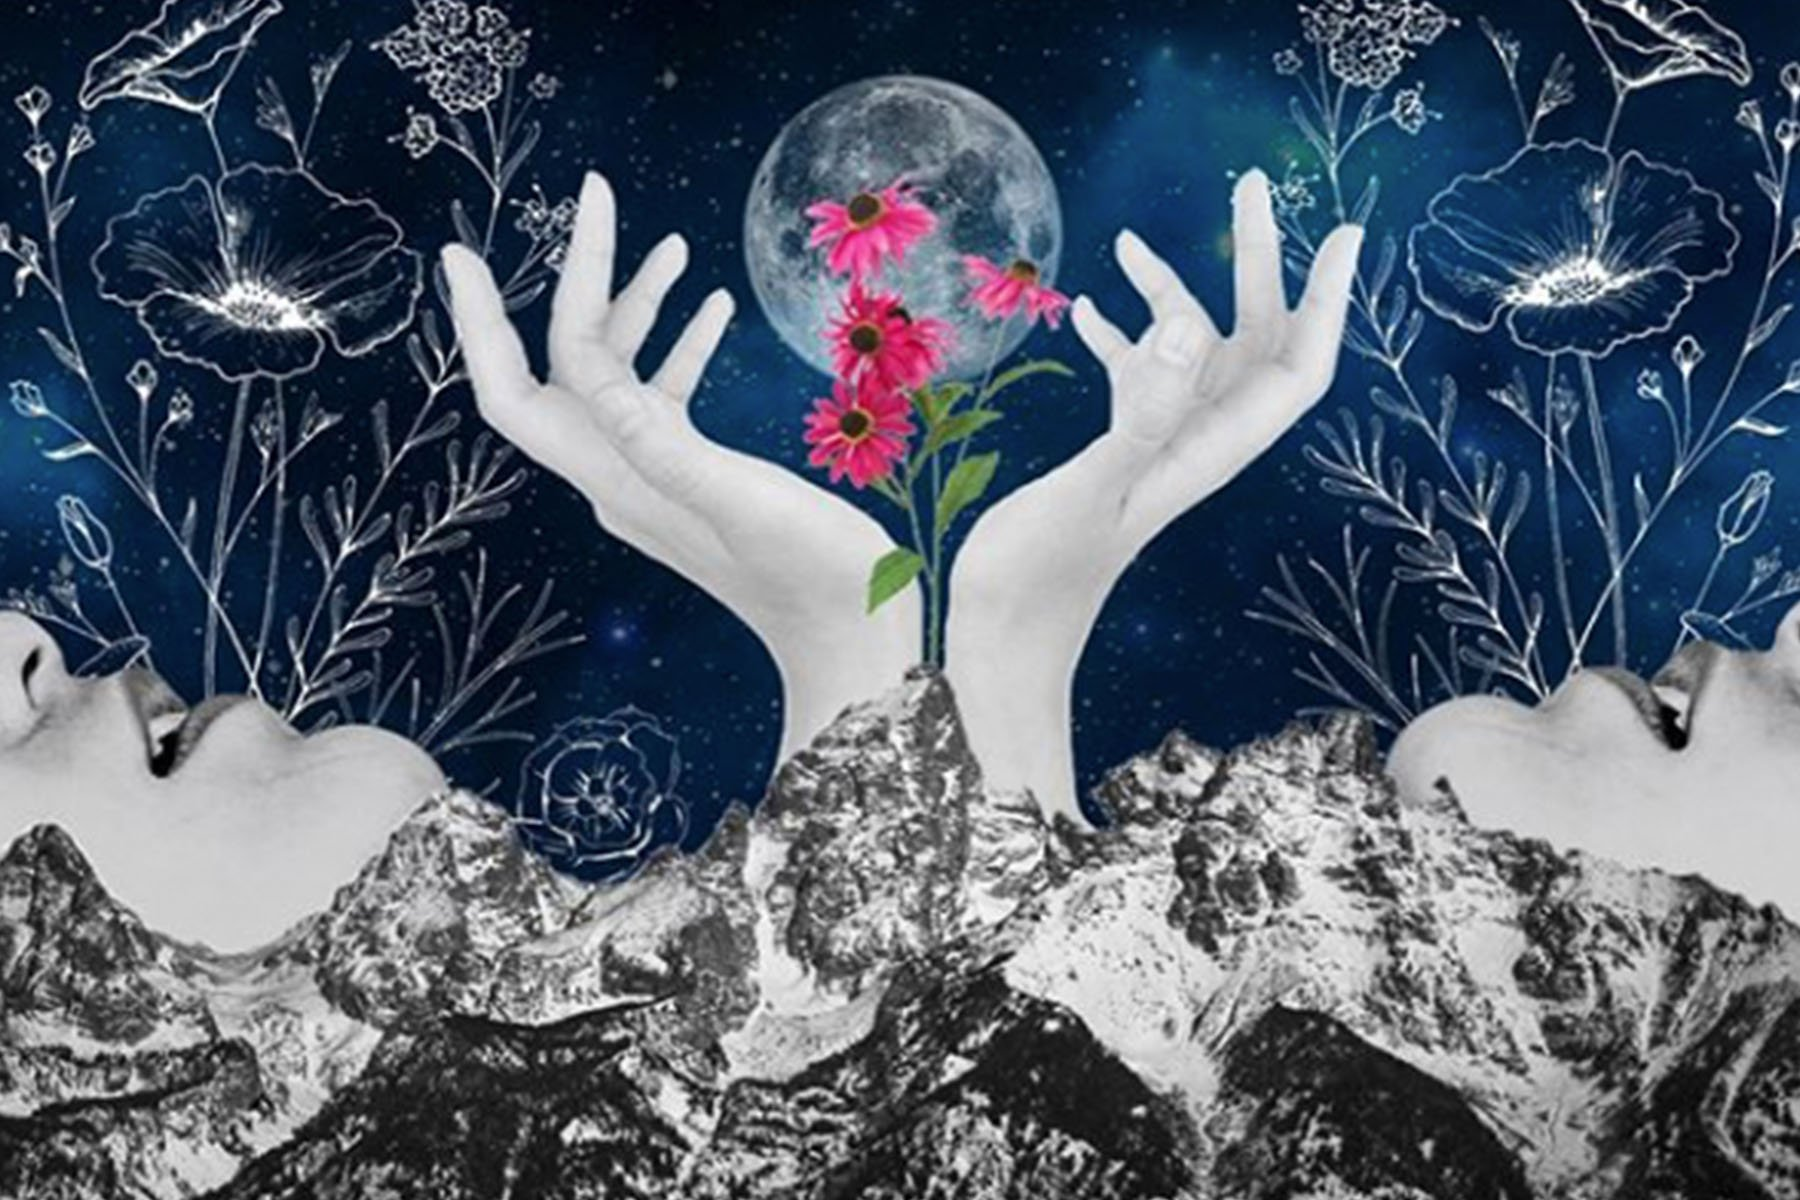 Weekly Horoscope: Full Moon in Taurus Brings Romance + Possessiveness